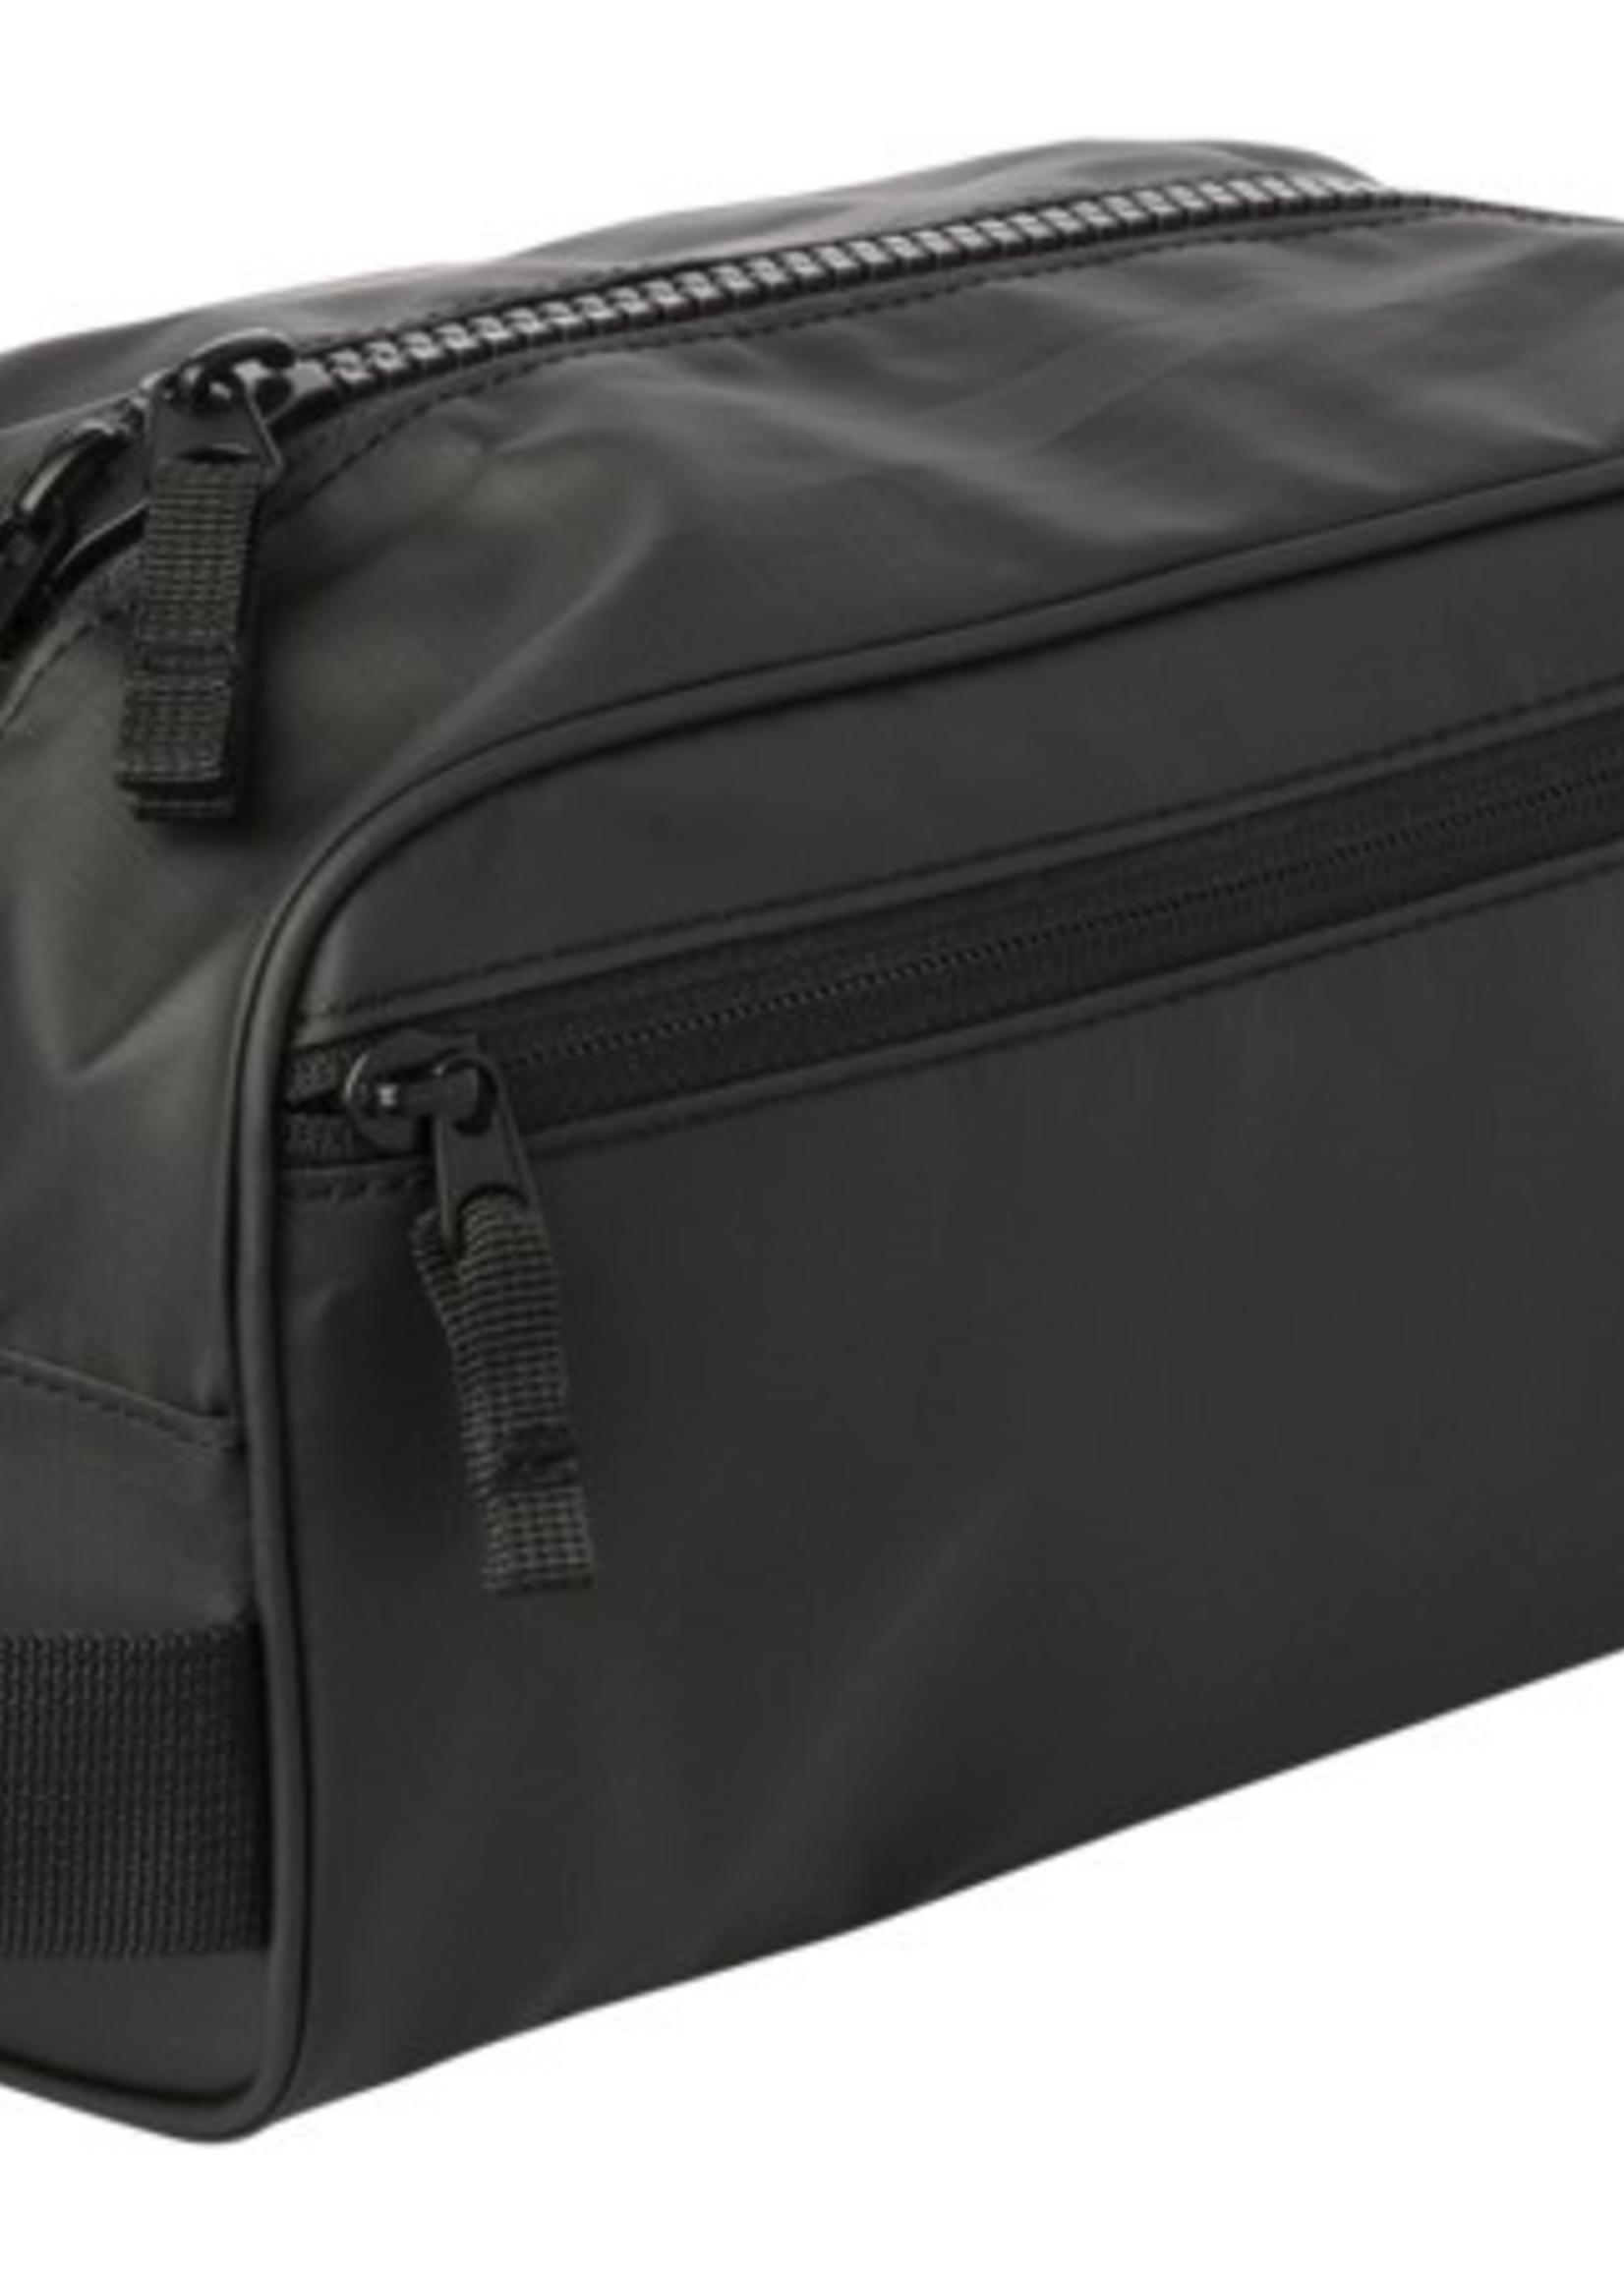 RVCA RVCA Dopp Kit Travel Bag